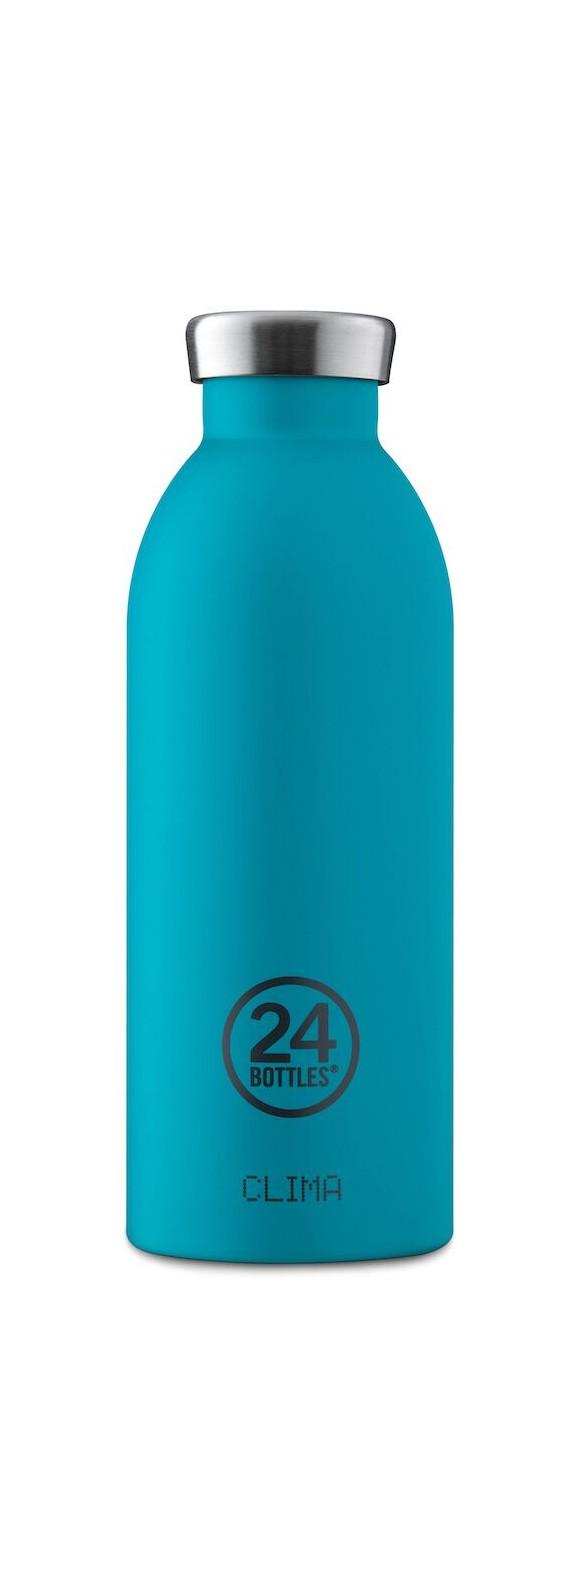 24 Bottles - Urban Bottle 0,5 L -Atlantic Bay